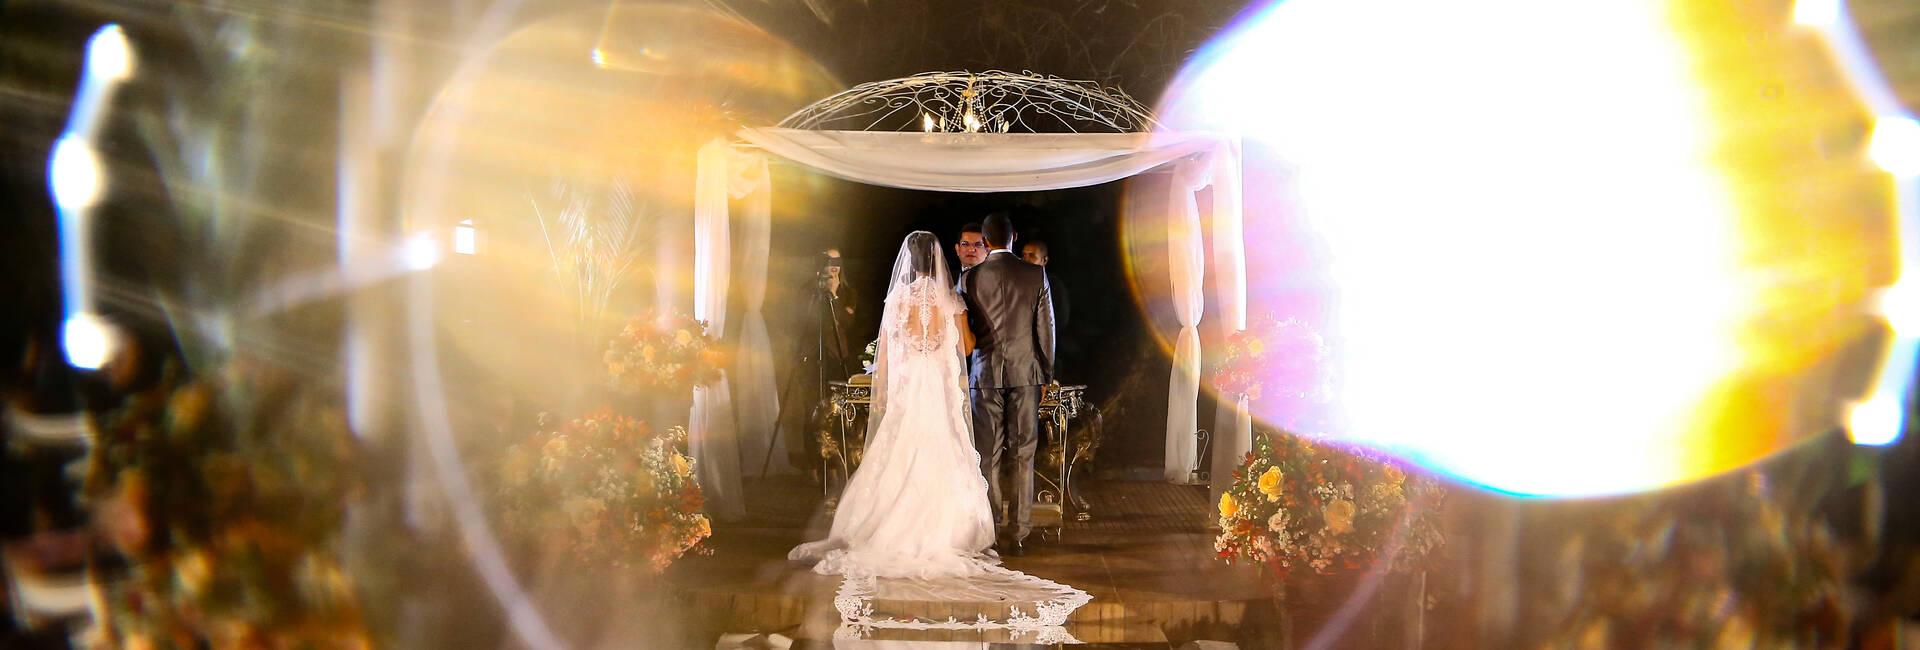 Casamento- de Maick e Dani-